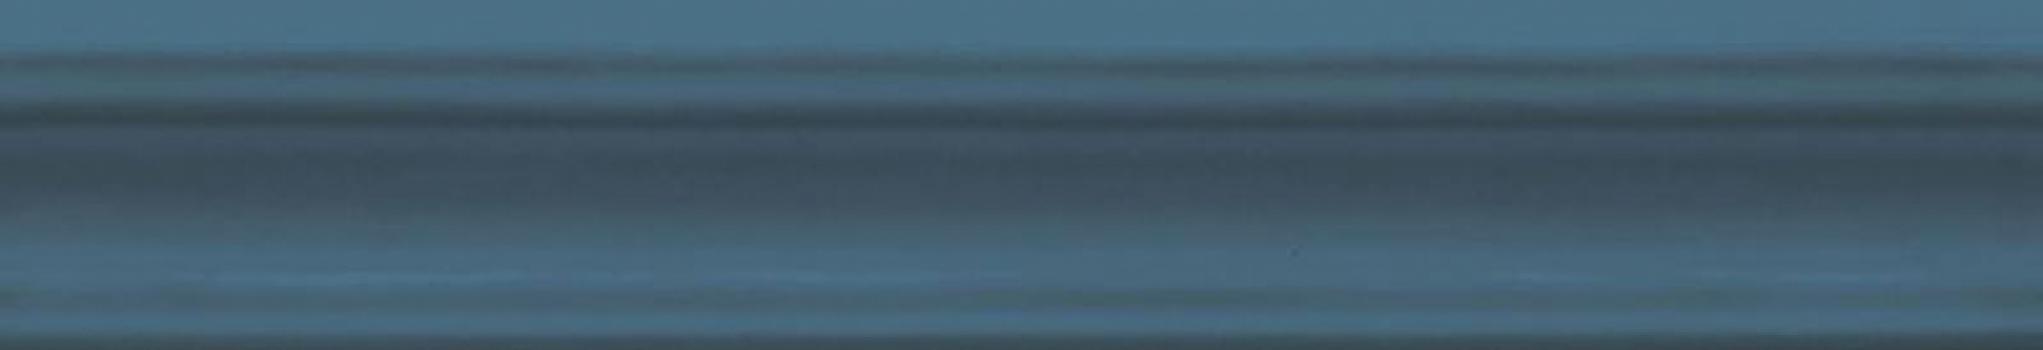 opal moldura marine 30*5 CIFRE